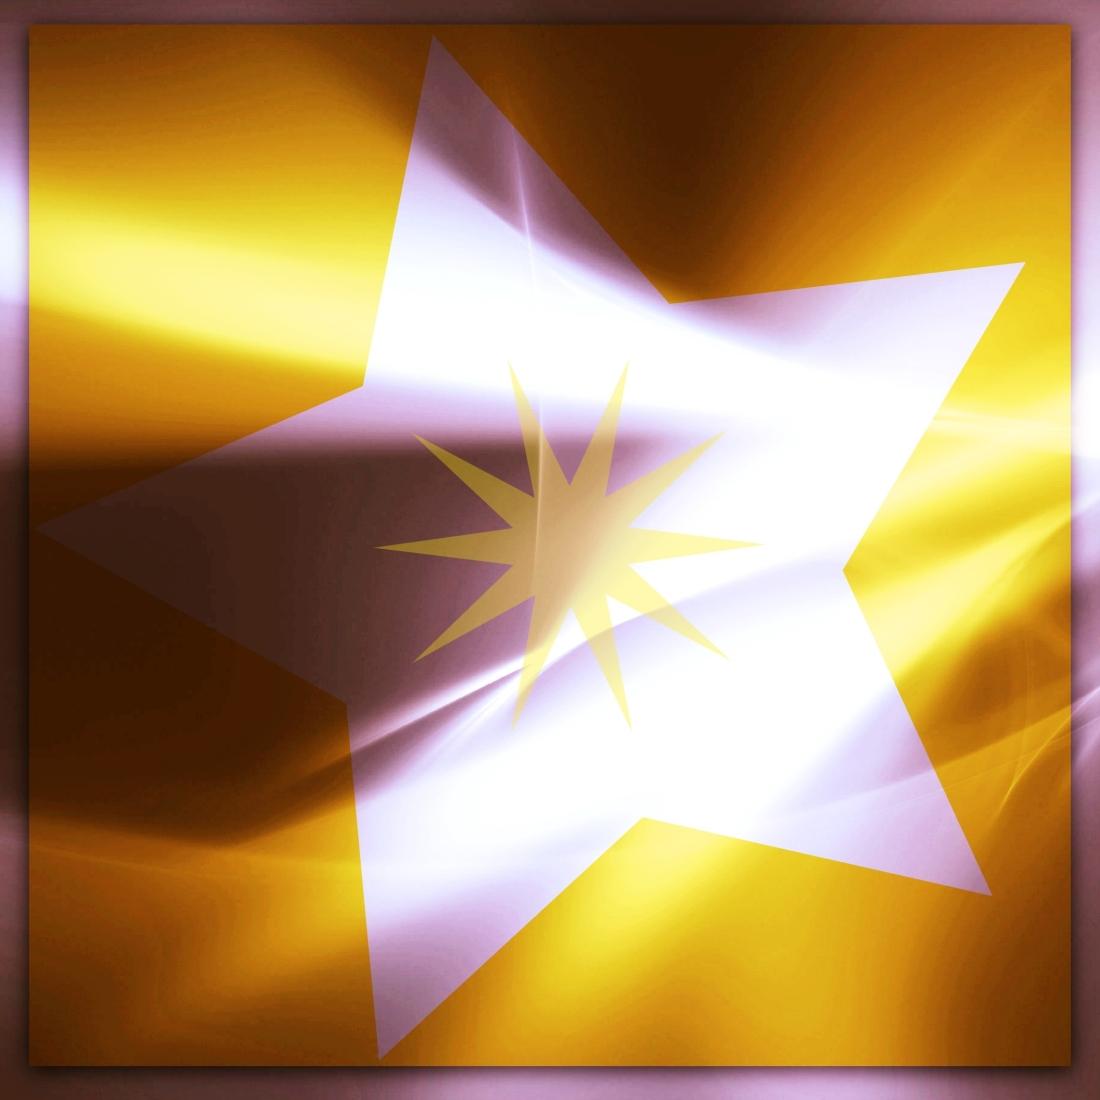 STAR GOLD & PURPLE